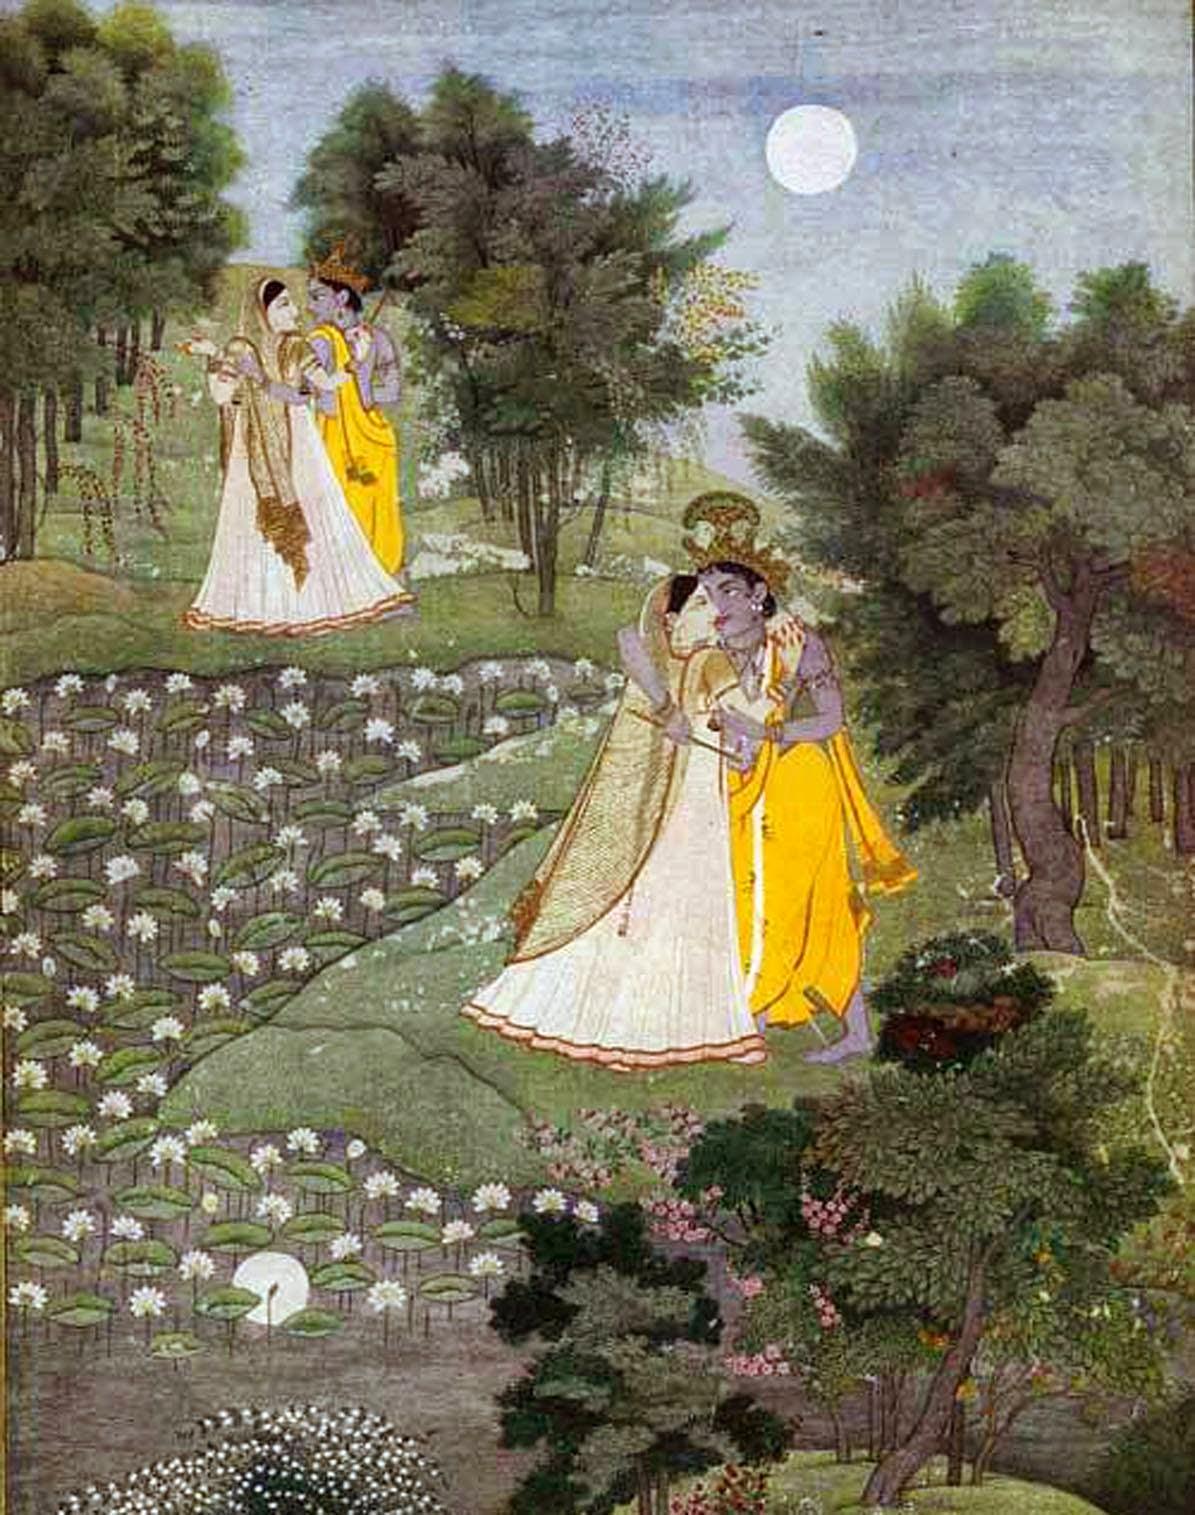 madangopal: paṭu and mṛdu synonyms